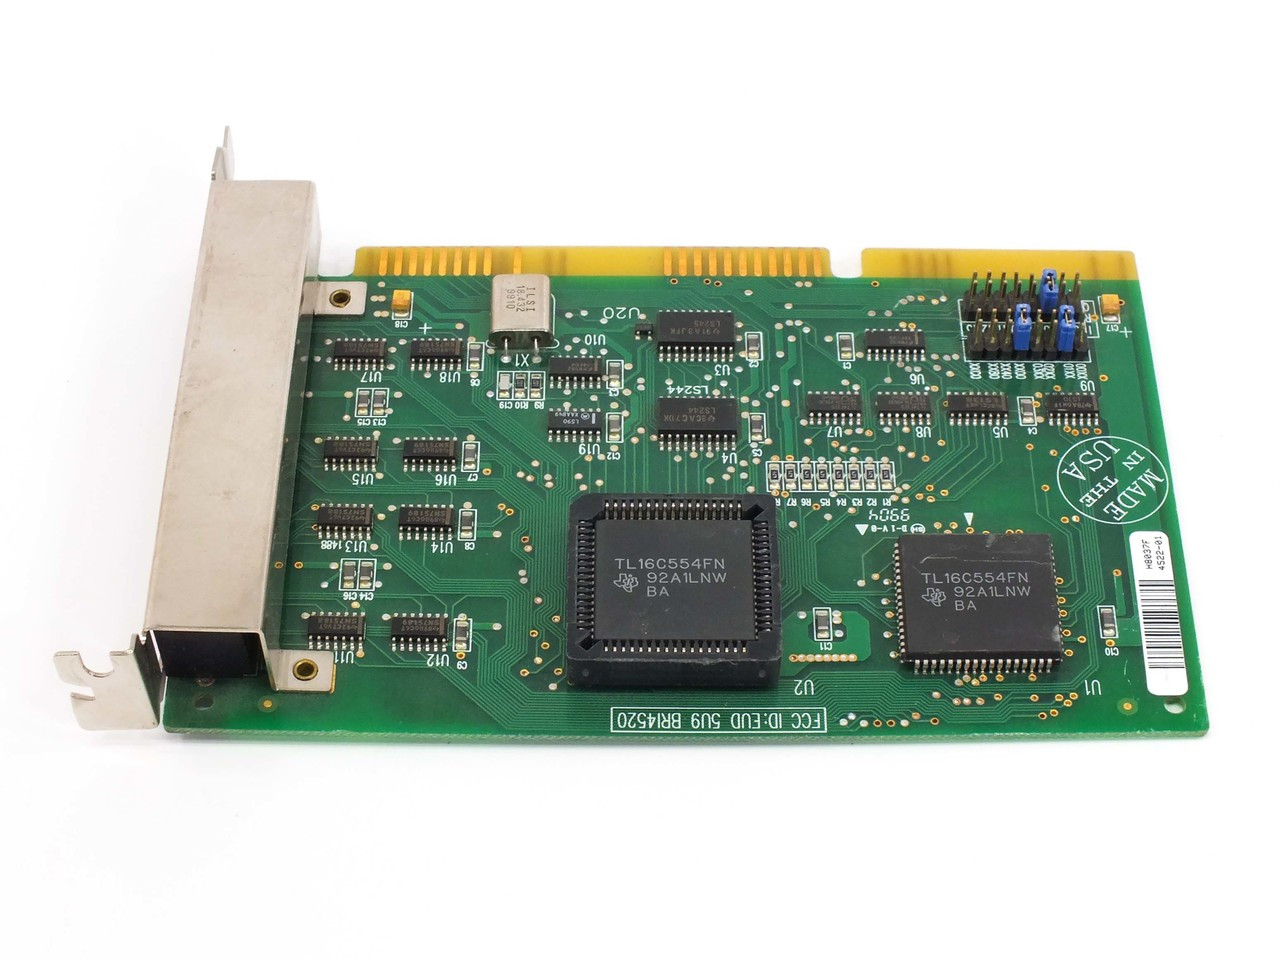 Boca Research 4522 8 Port 16 Bit ISA Internal Modem Card